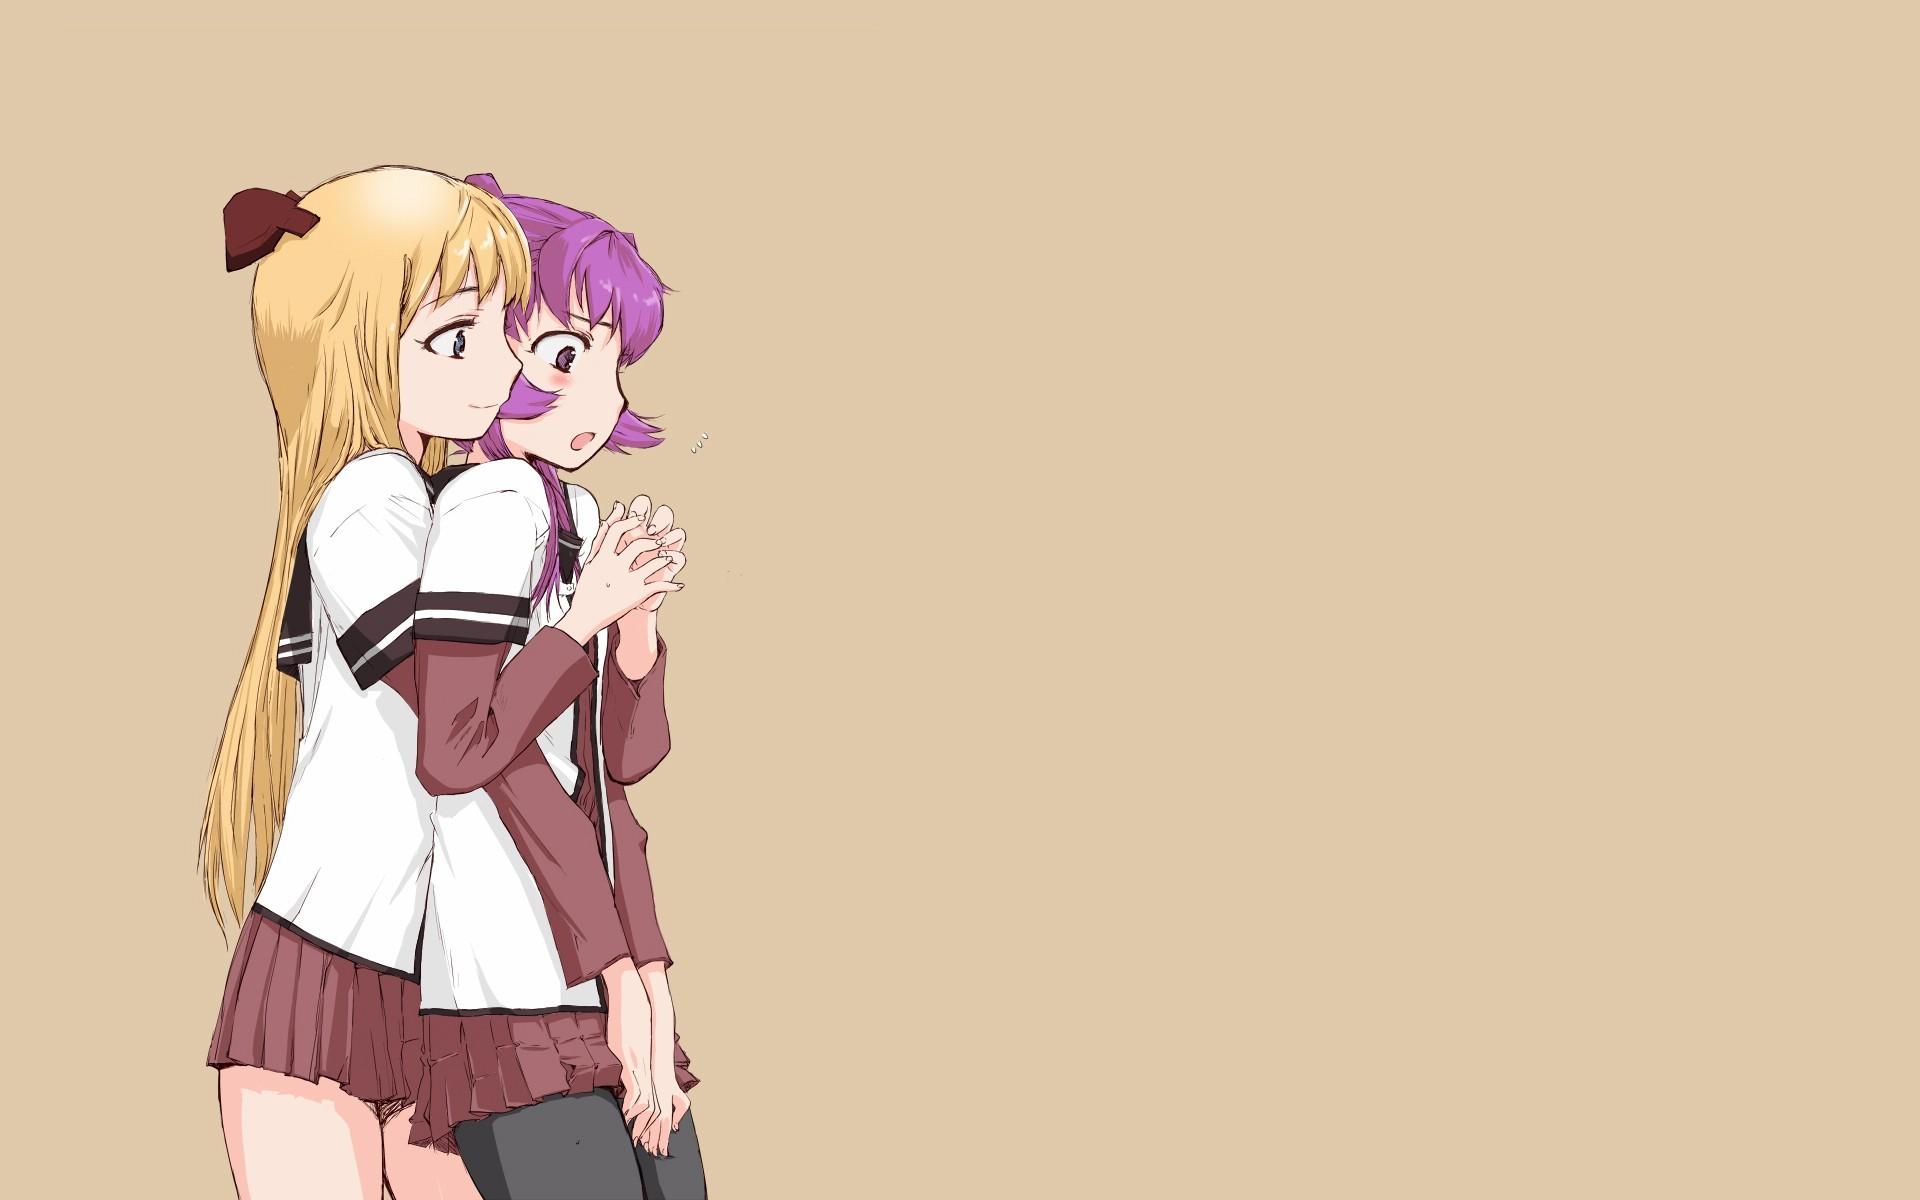 Anime Girls Blondes Blue Eyes Brown Background Hair Ornaments Long Purple  Simple Sugiura Ayano Toshinou Kyouko Yuru Yuri